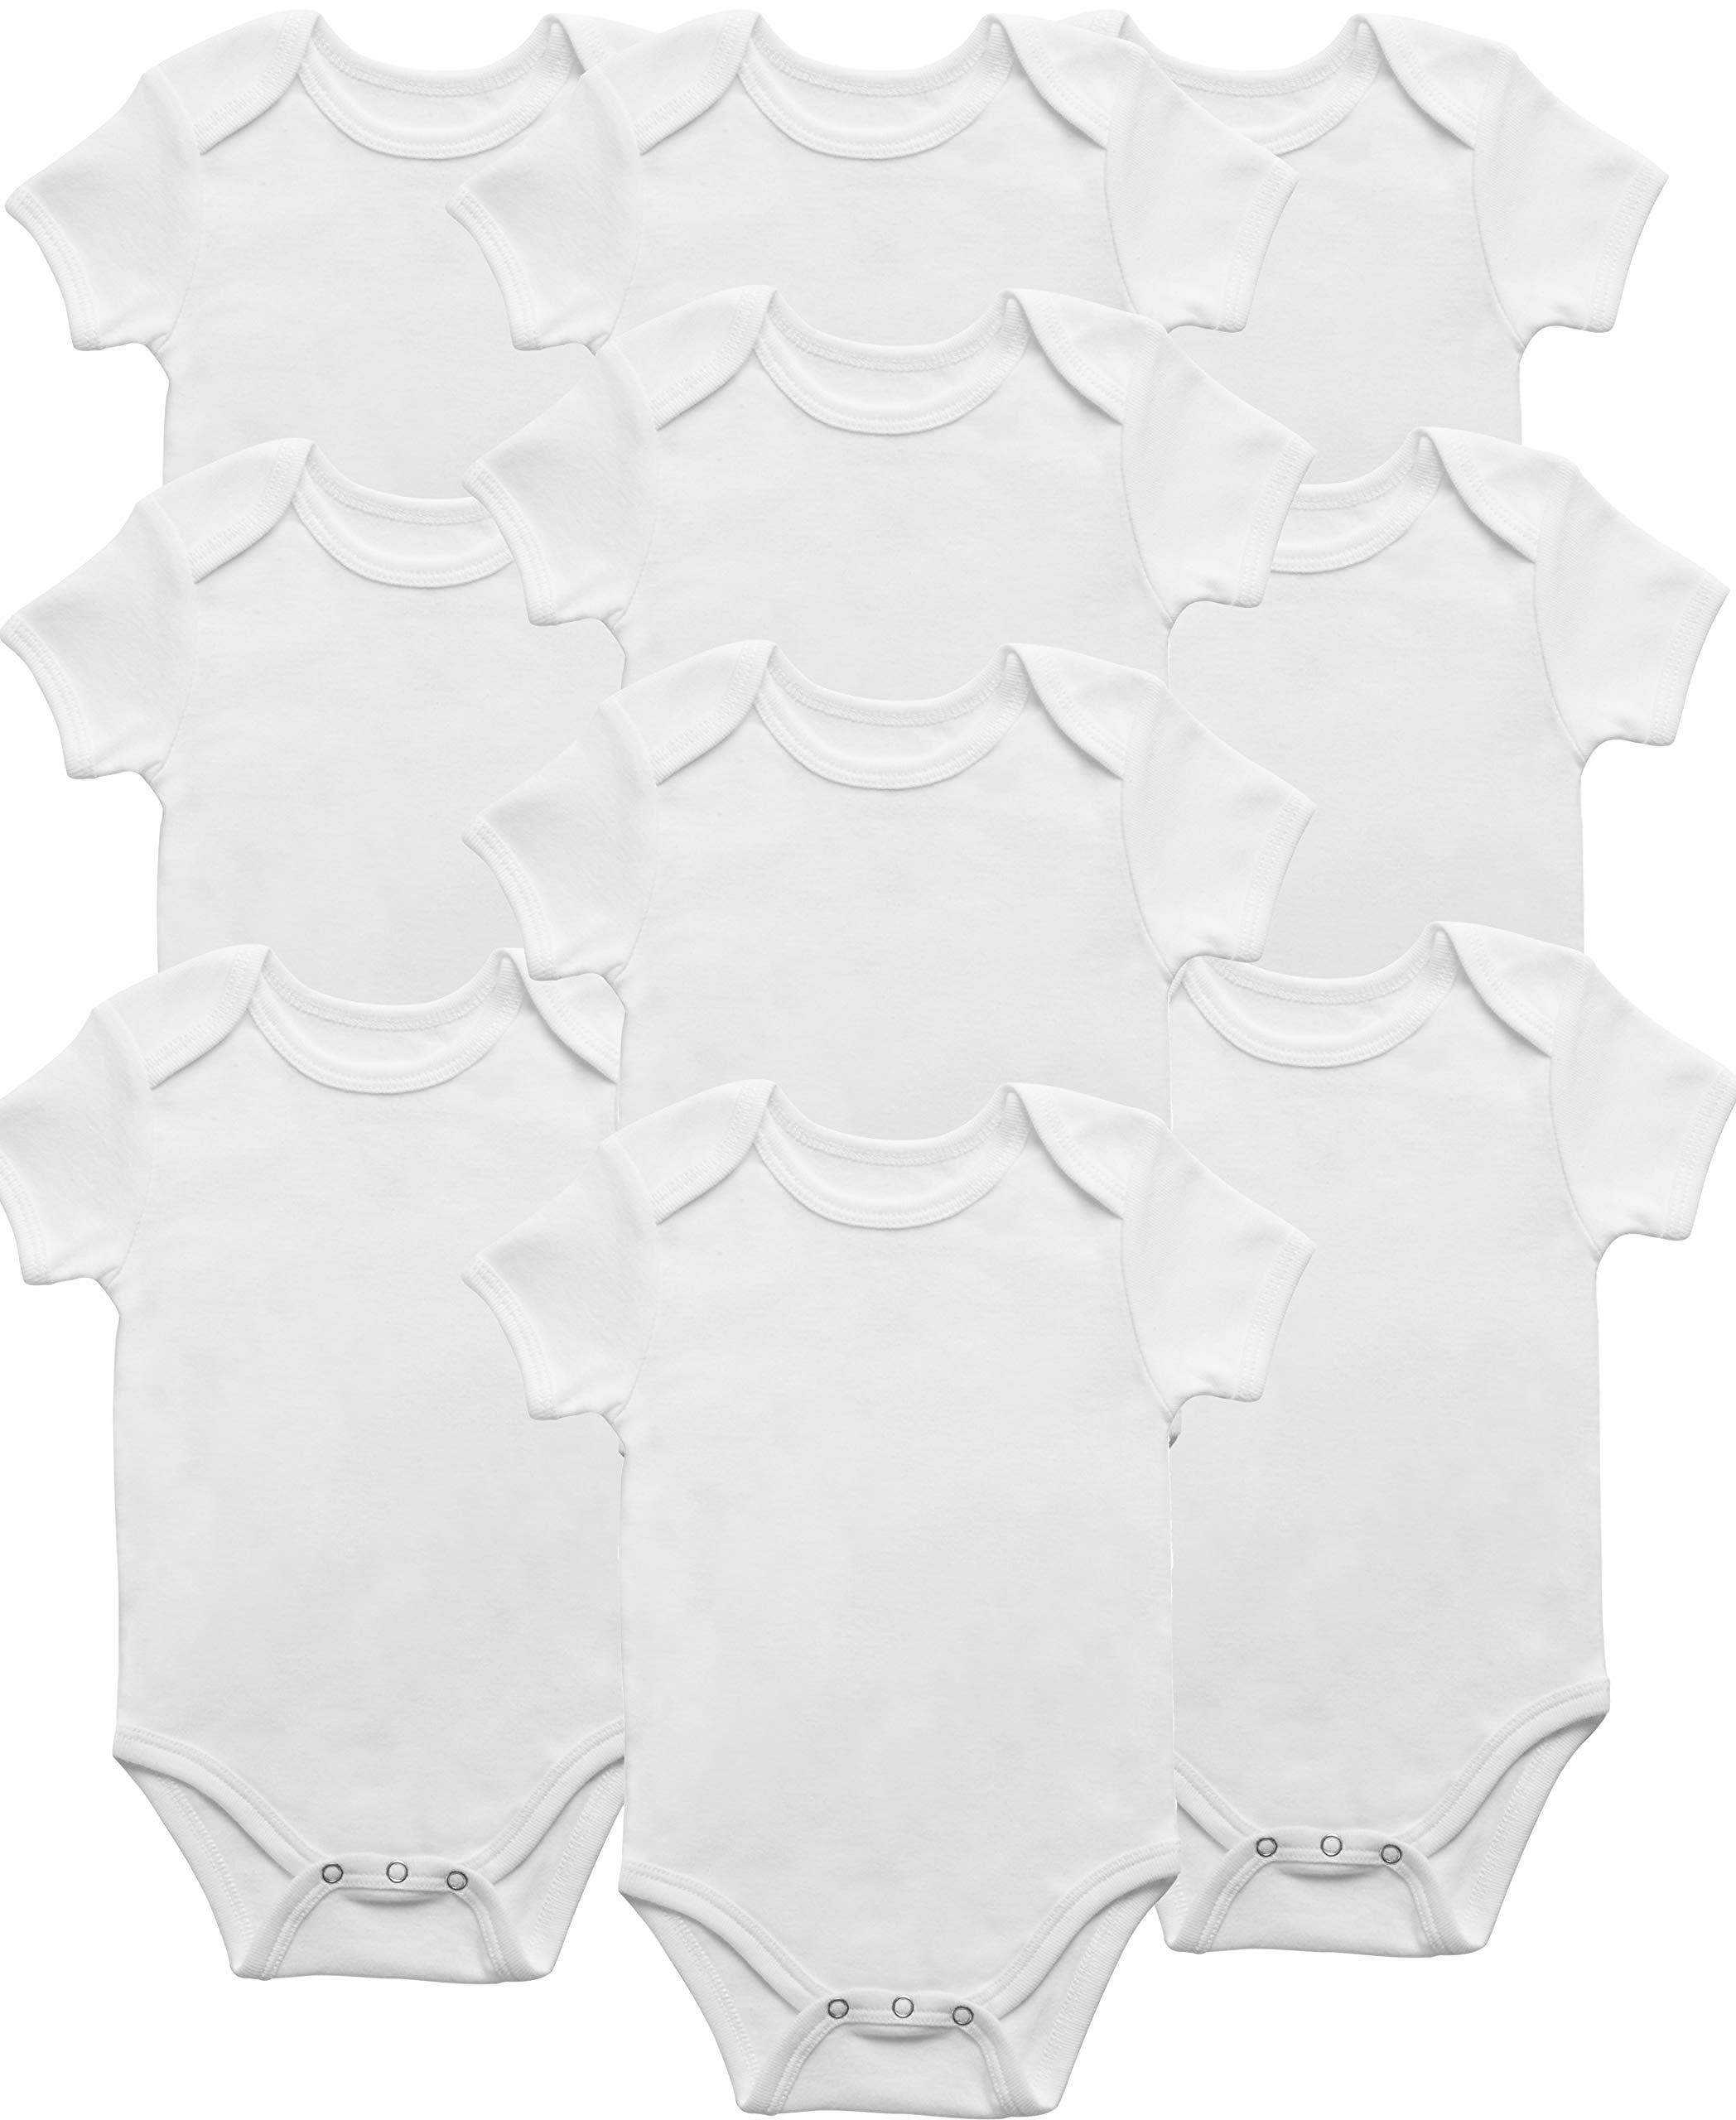 Soft Organic Cotton Baby Onesie One Piece 3 Snap Bodysuit 10 Pack Hypoallergenic & Made a Mother & Nurse Love